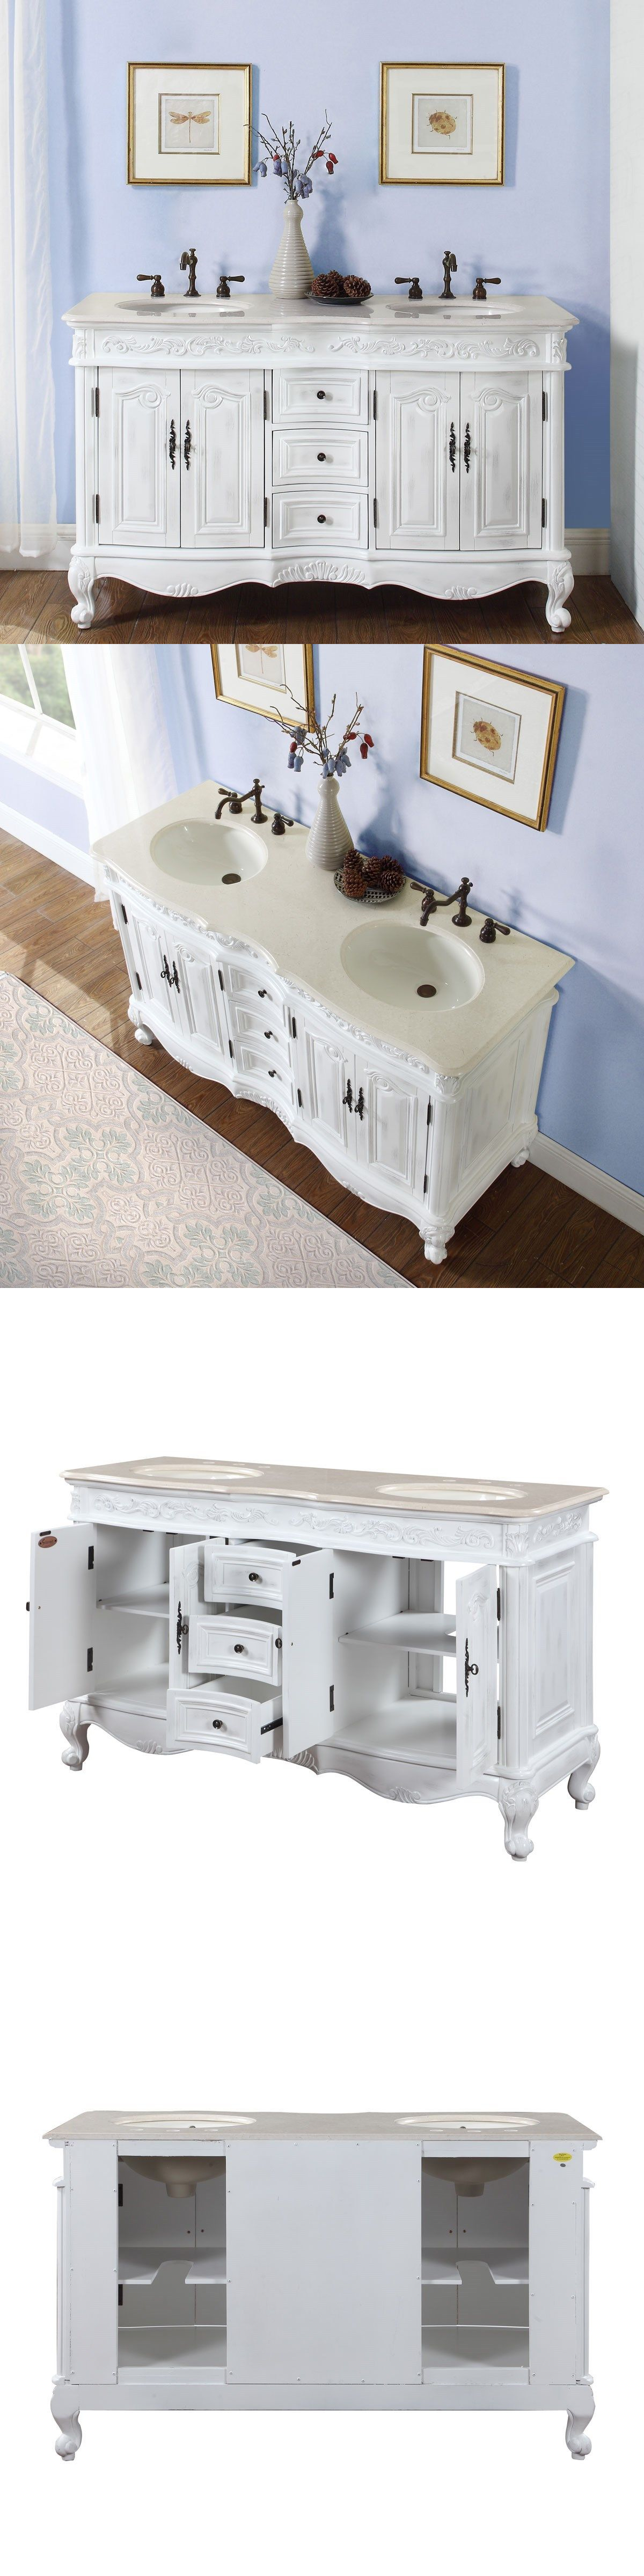 Vanities 115625: 58-Inch Creamy Marble Stone Top Bathroom Vanity Double  Sink Bath Cabinet